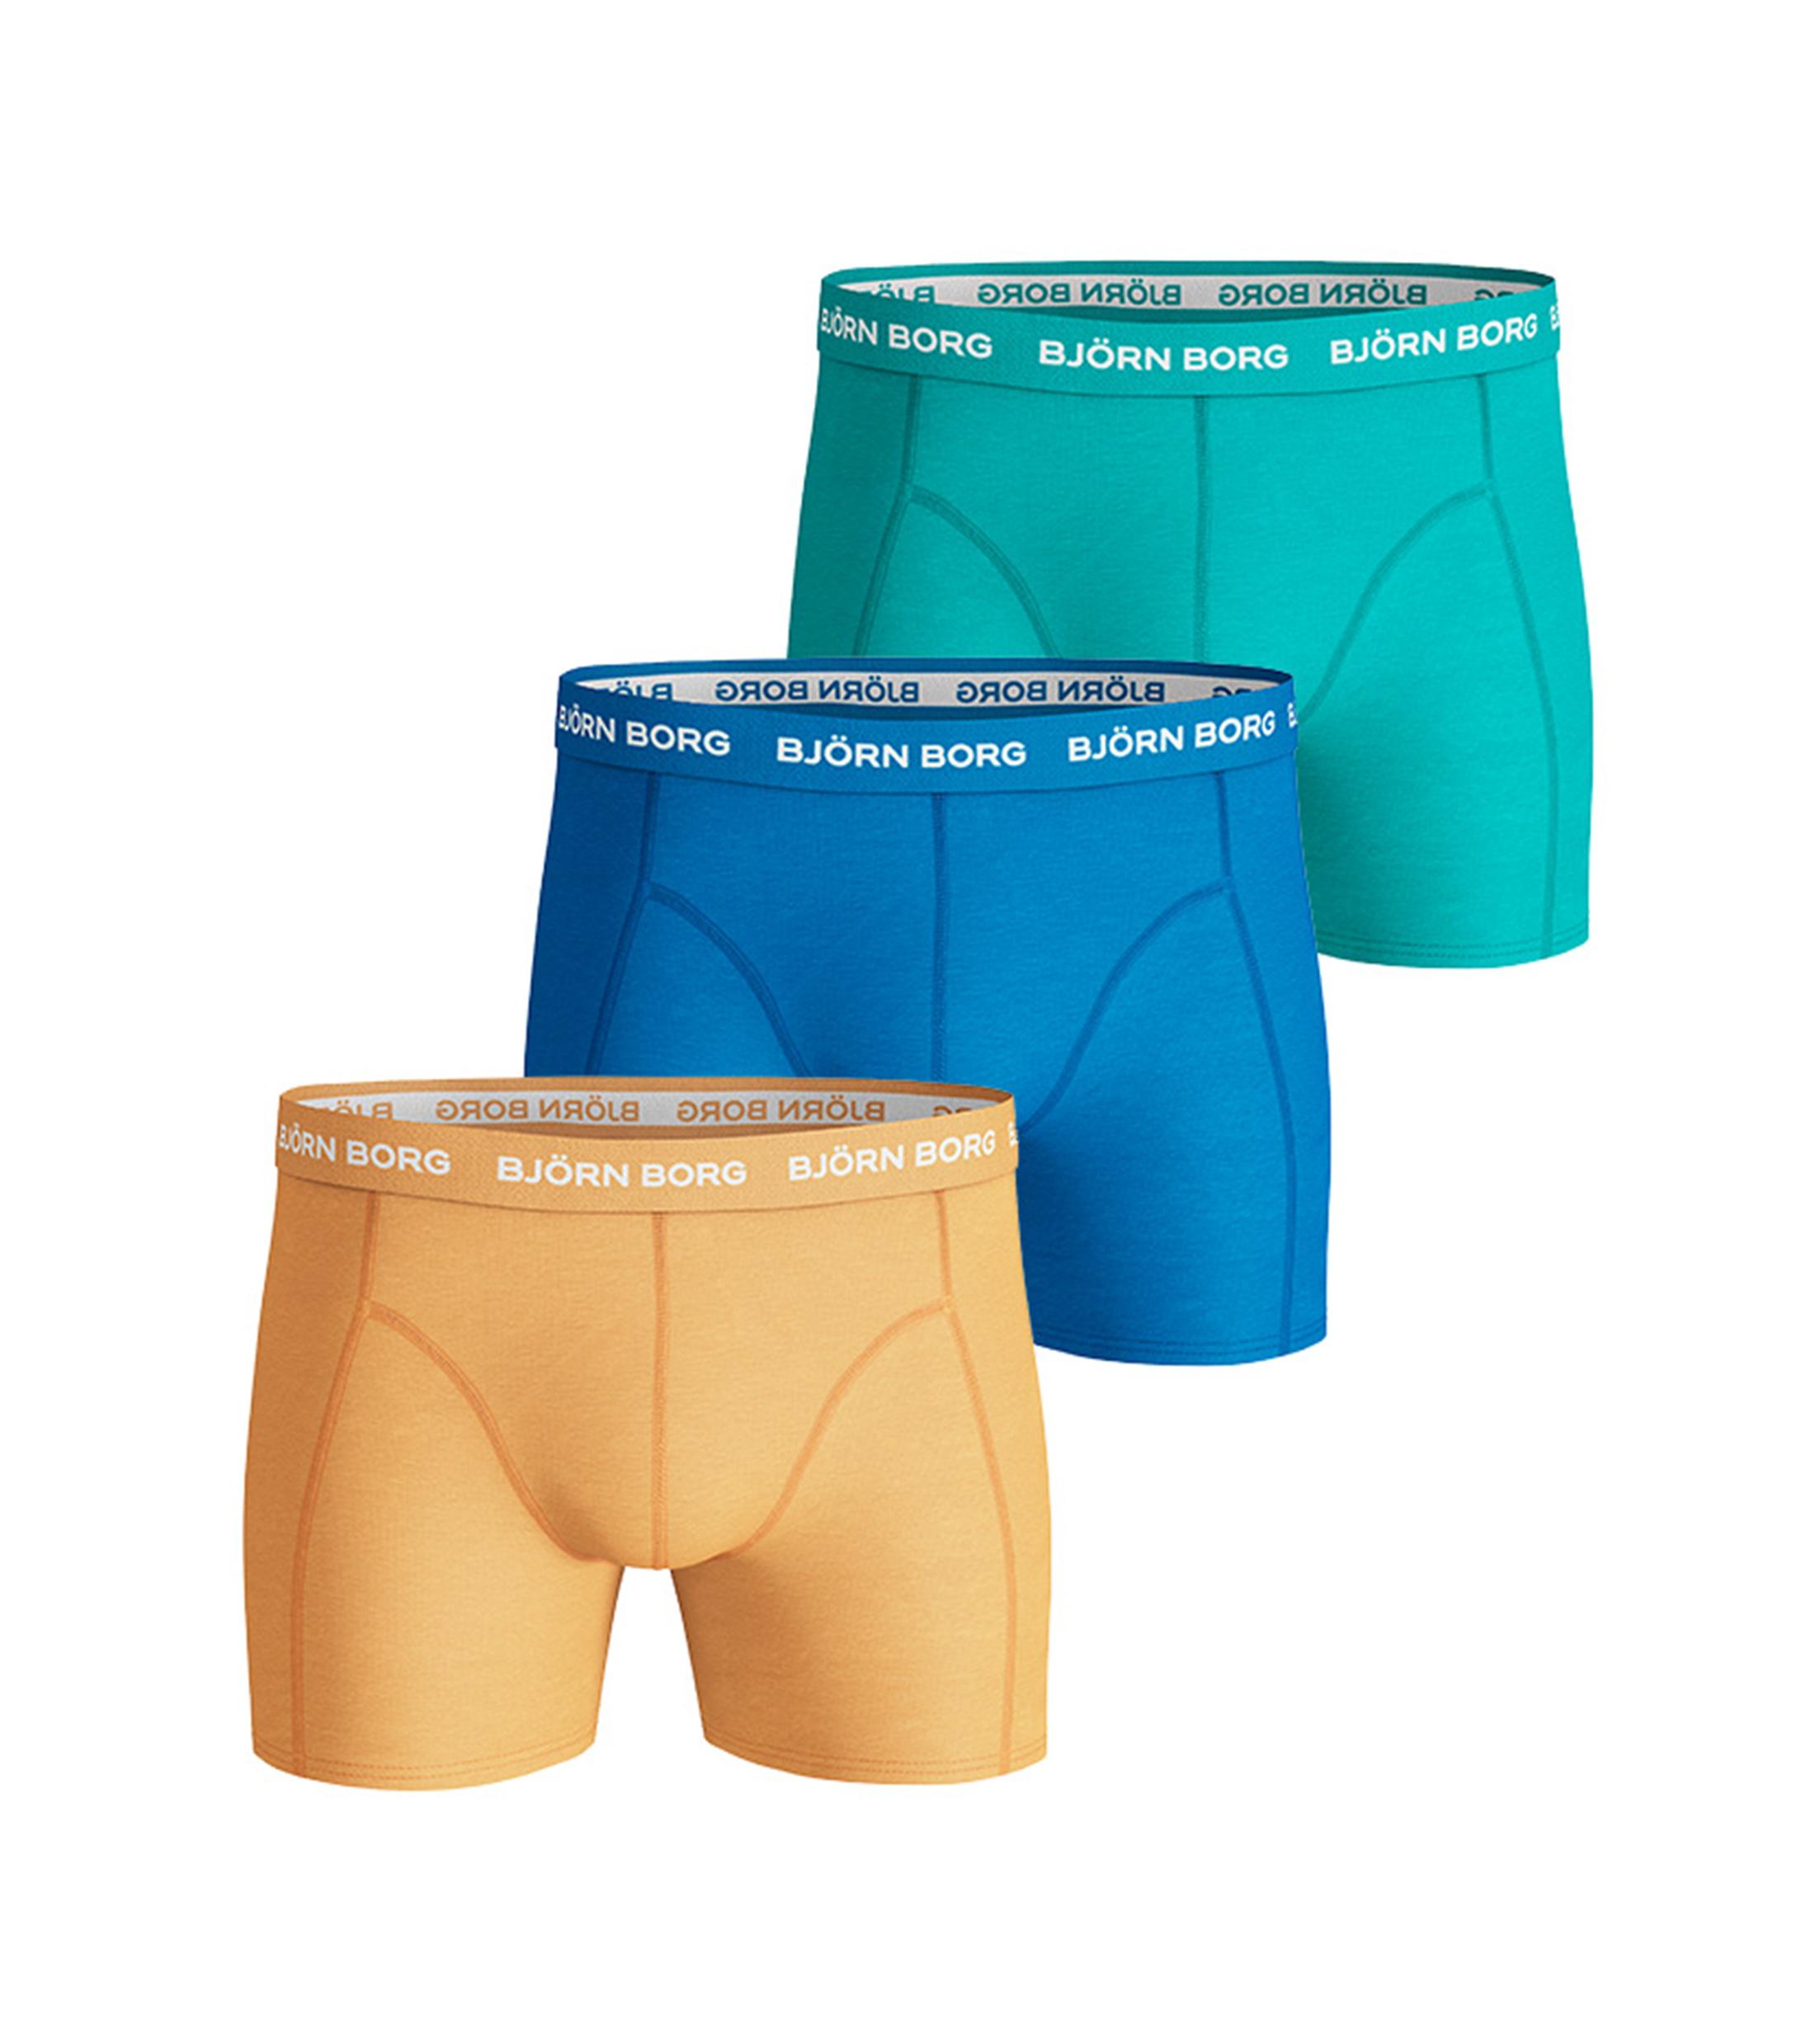 bjorn borg essential boxershorts 3 pack online bestellen suitable. Black Bedroom Furniture Sets. Home Design Ideas